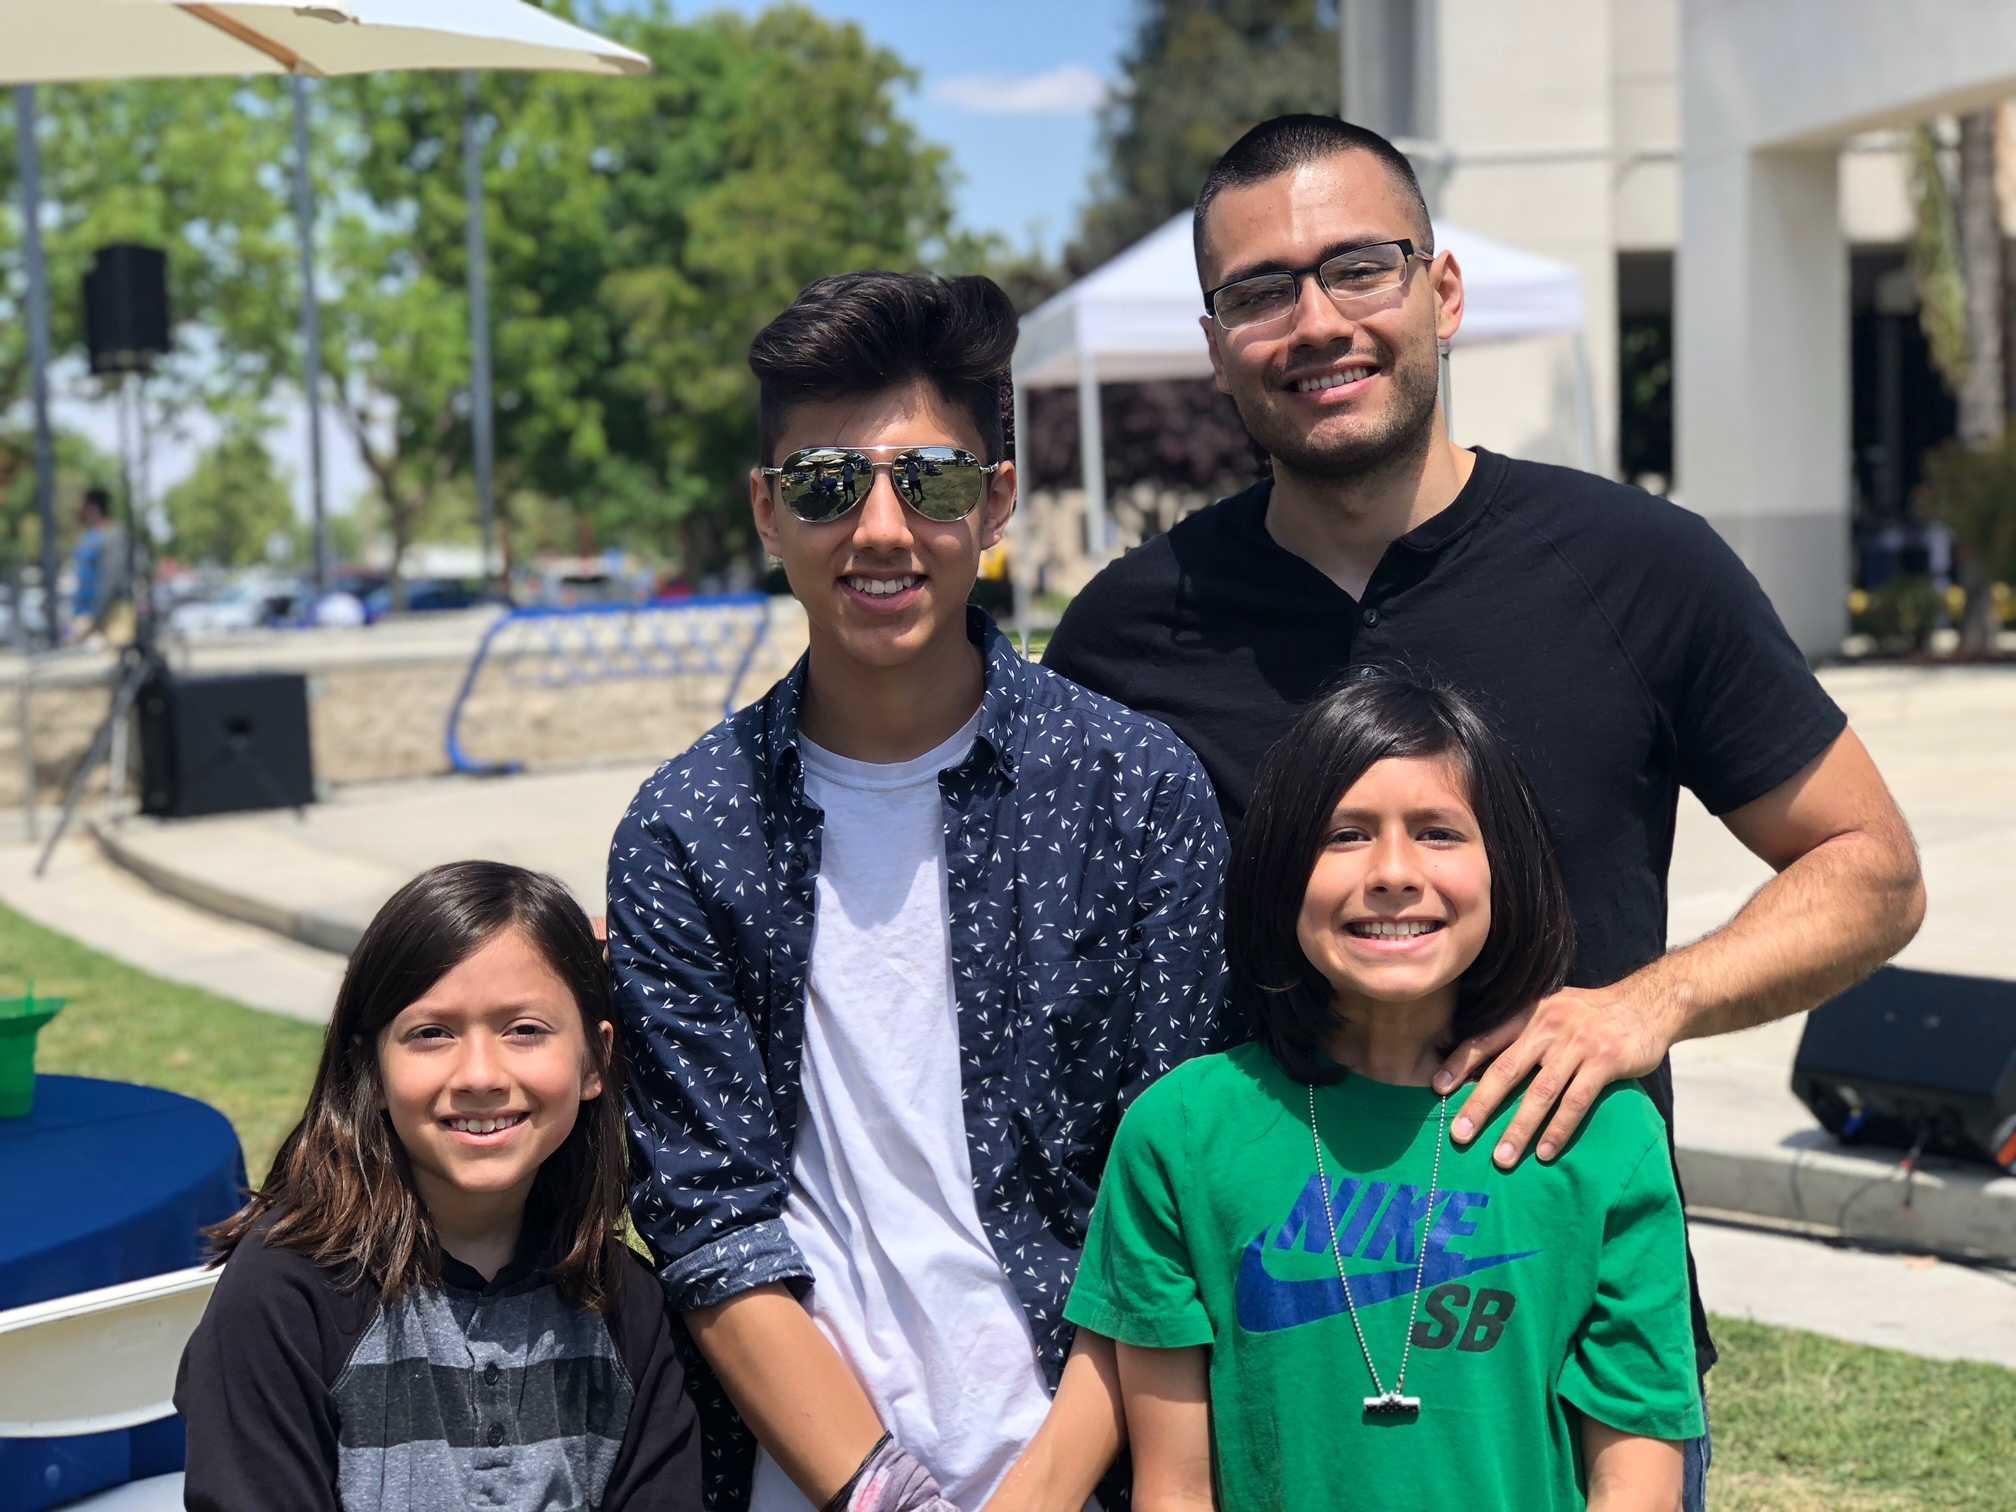 Creation rocks Bakersfield's Got Talent